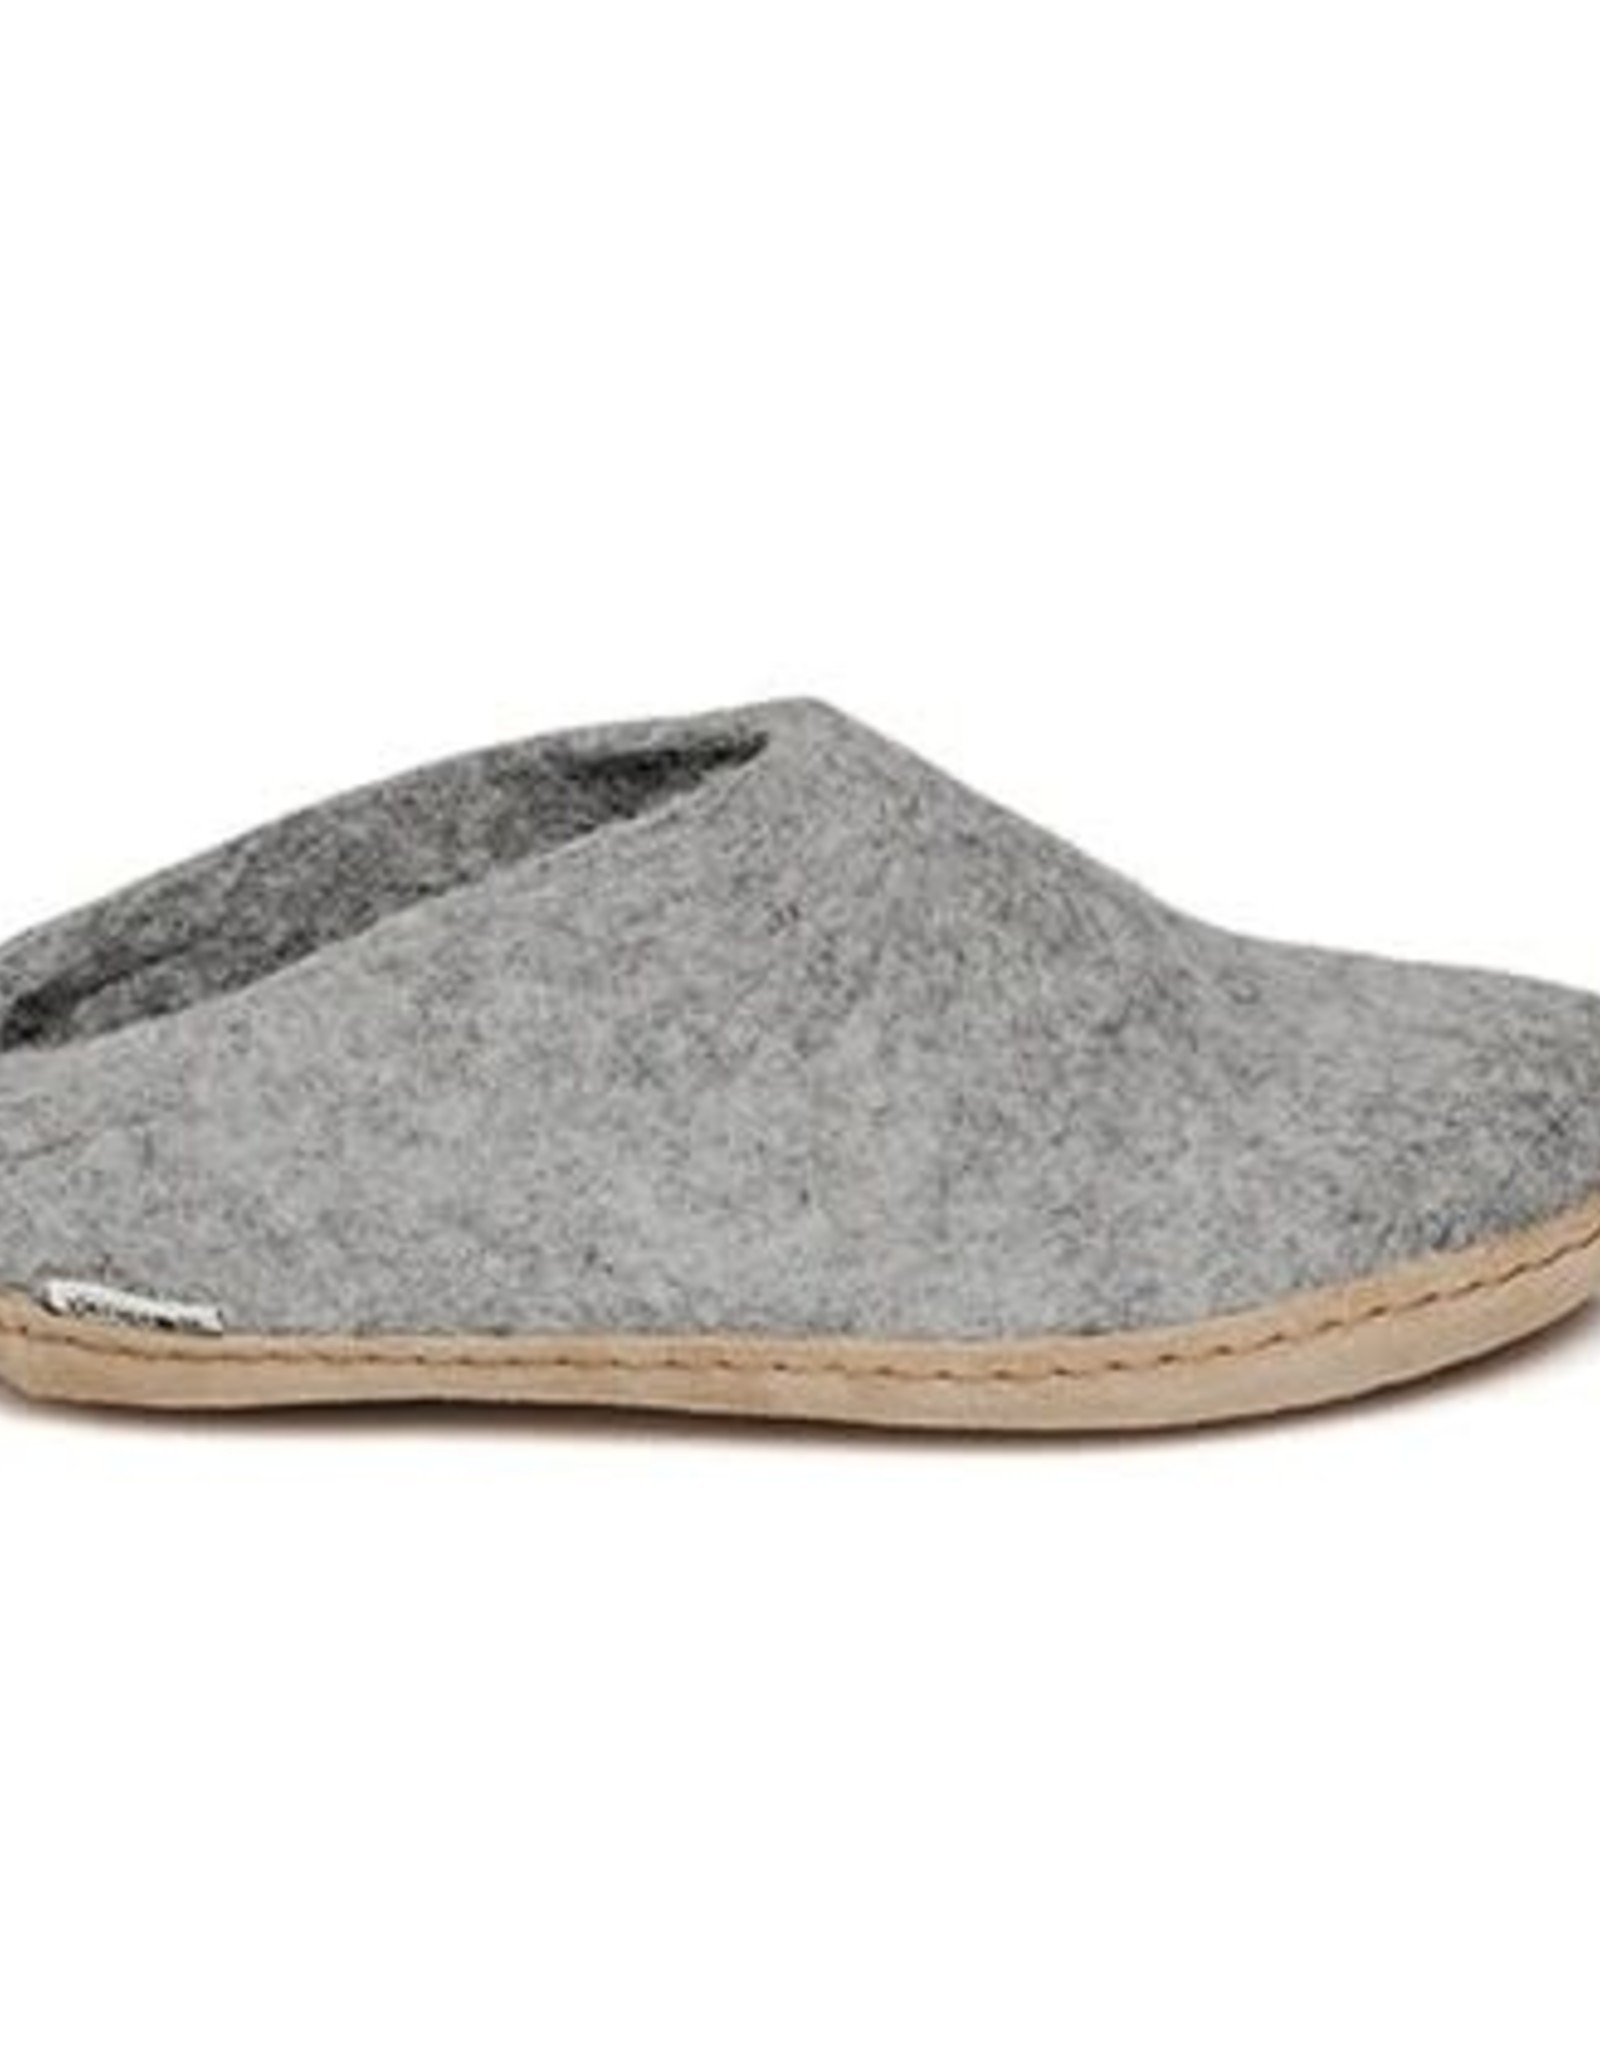 Glerups Pantoufles Glerups Grey